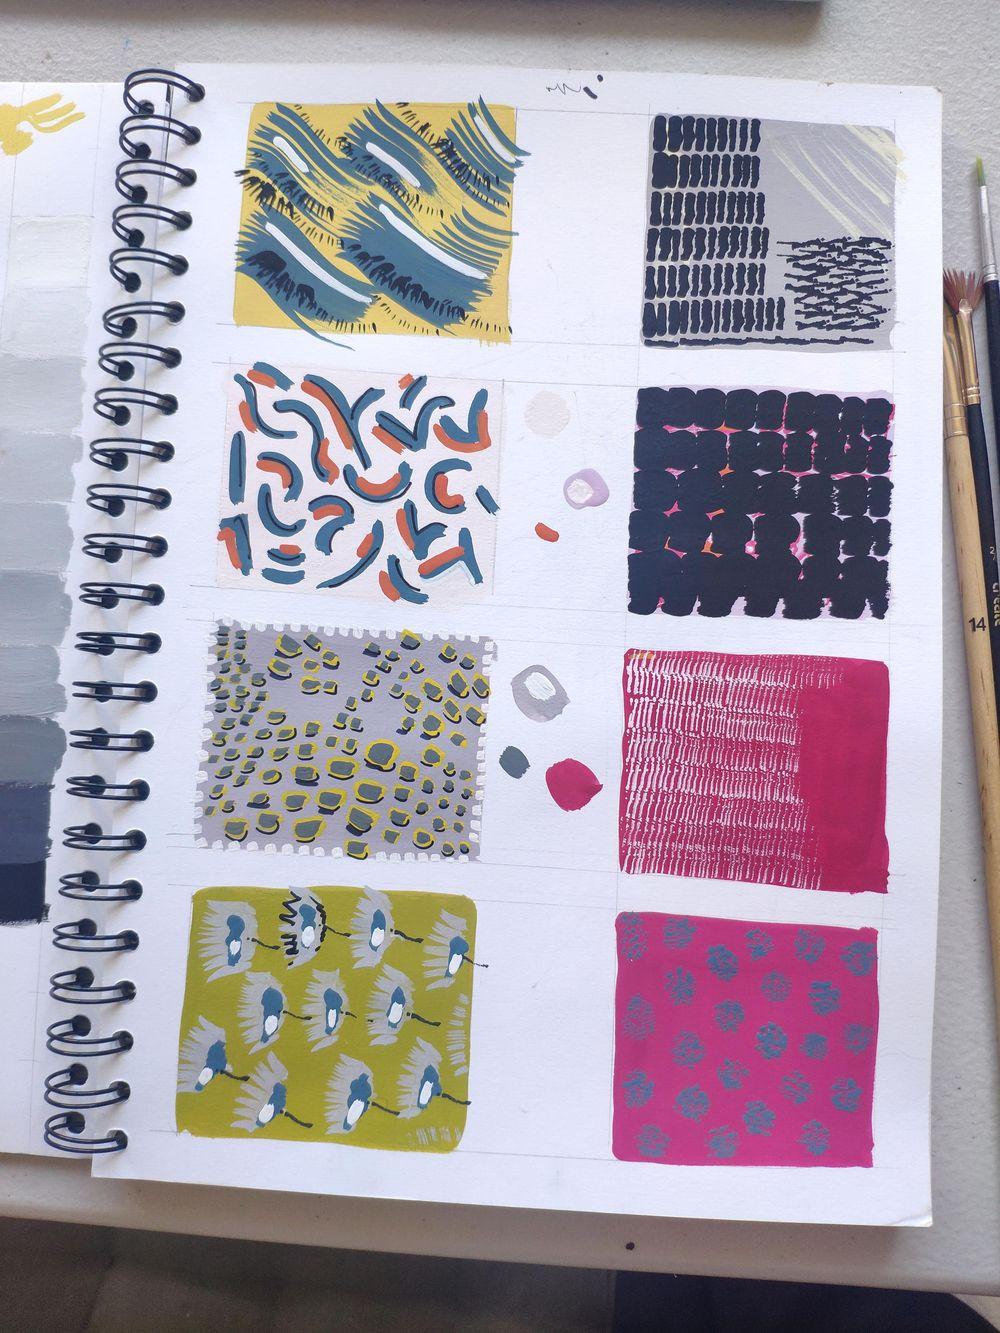 Pattern fun - image 3 - student project